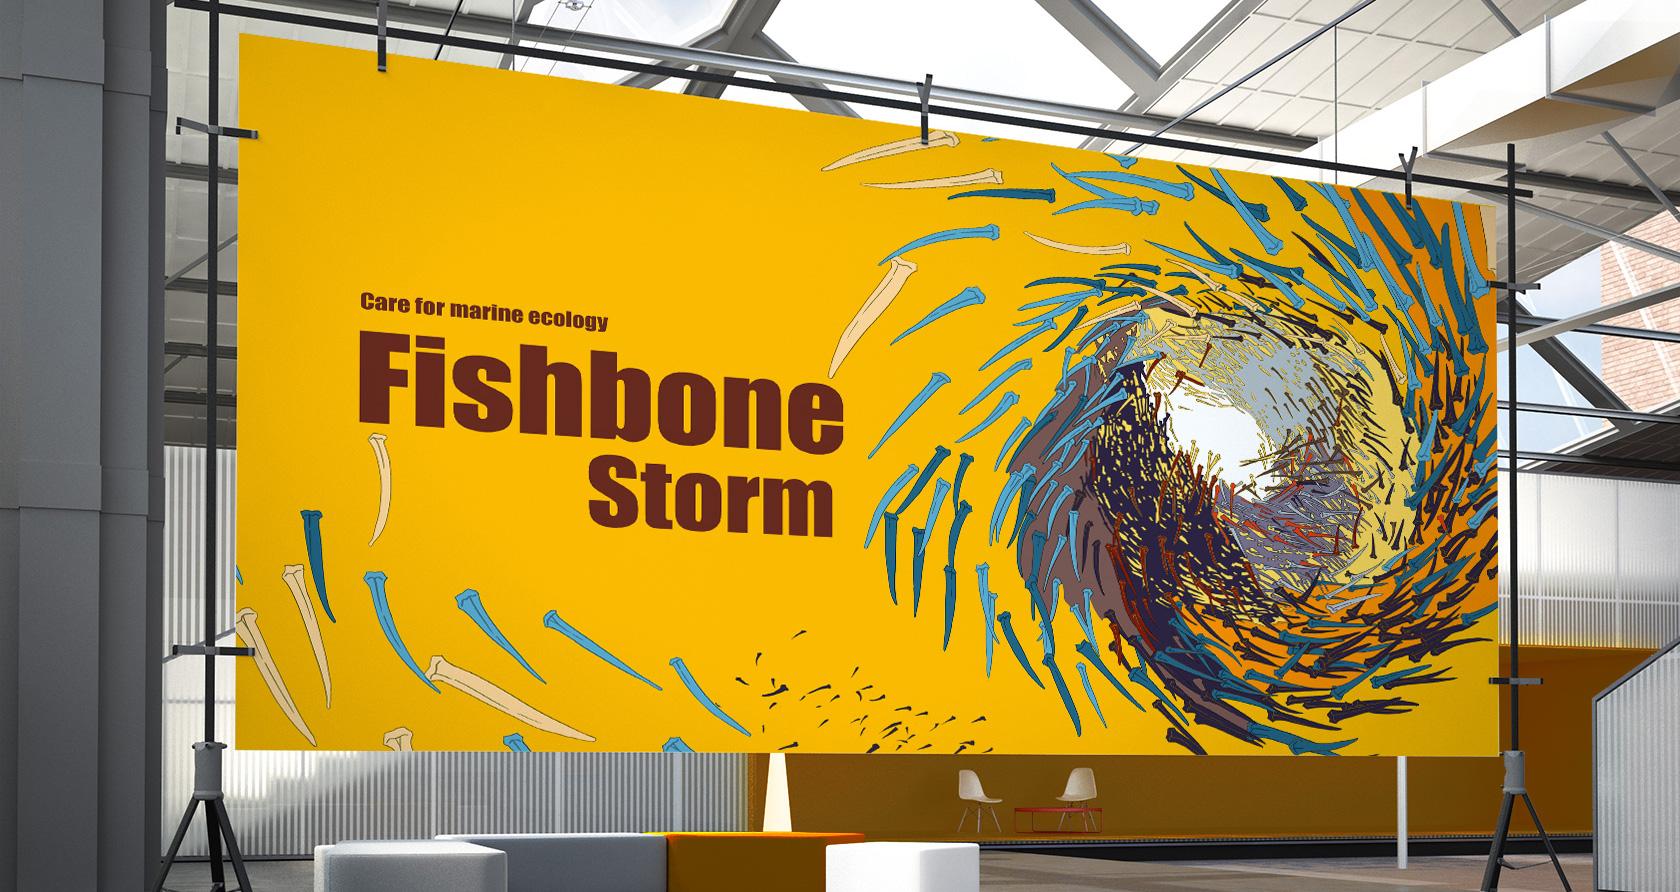 Fishbone Storm(2019)